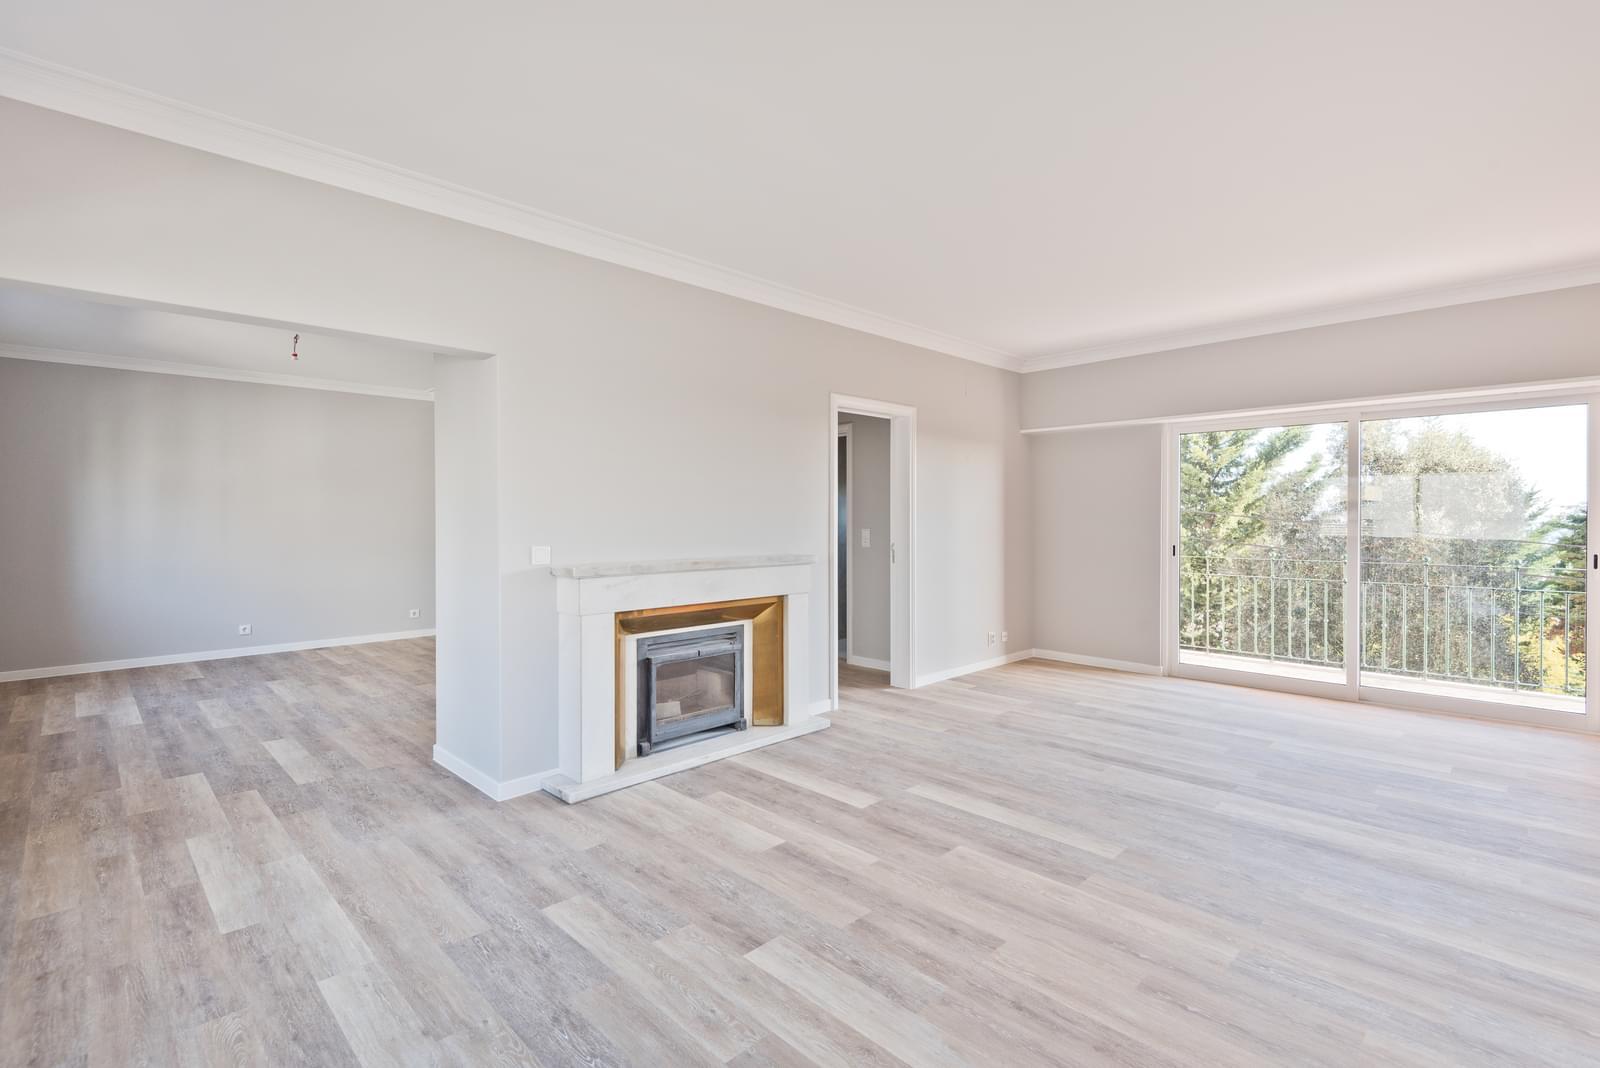 pf18956-apartamento-t3-1-cascais-0774fc30-07e8-4dc7-a647-a516bb69f0a8